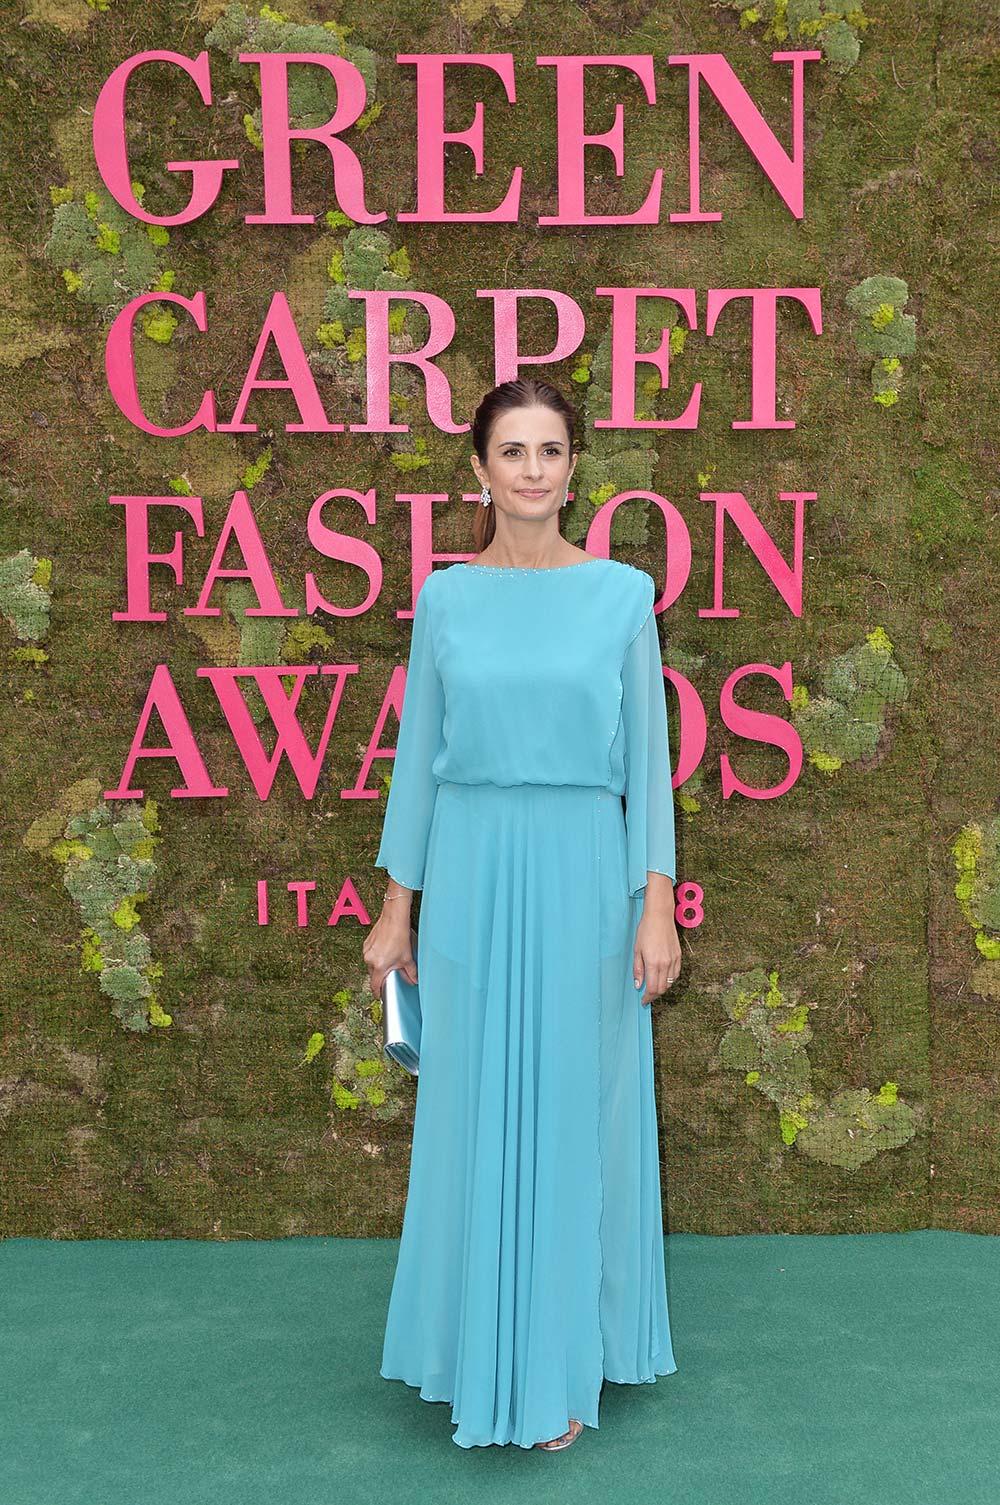 Green Carpet Fashion Awards 2018 - Livia Firth - Hair Massimo Serini - Makeup Emanuela Di Giammarco